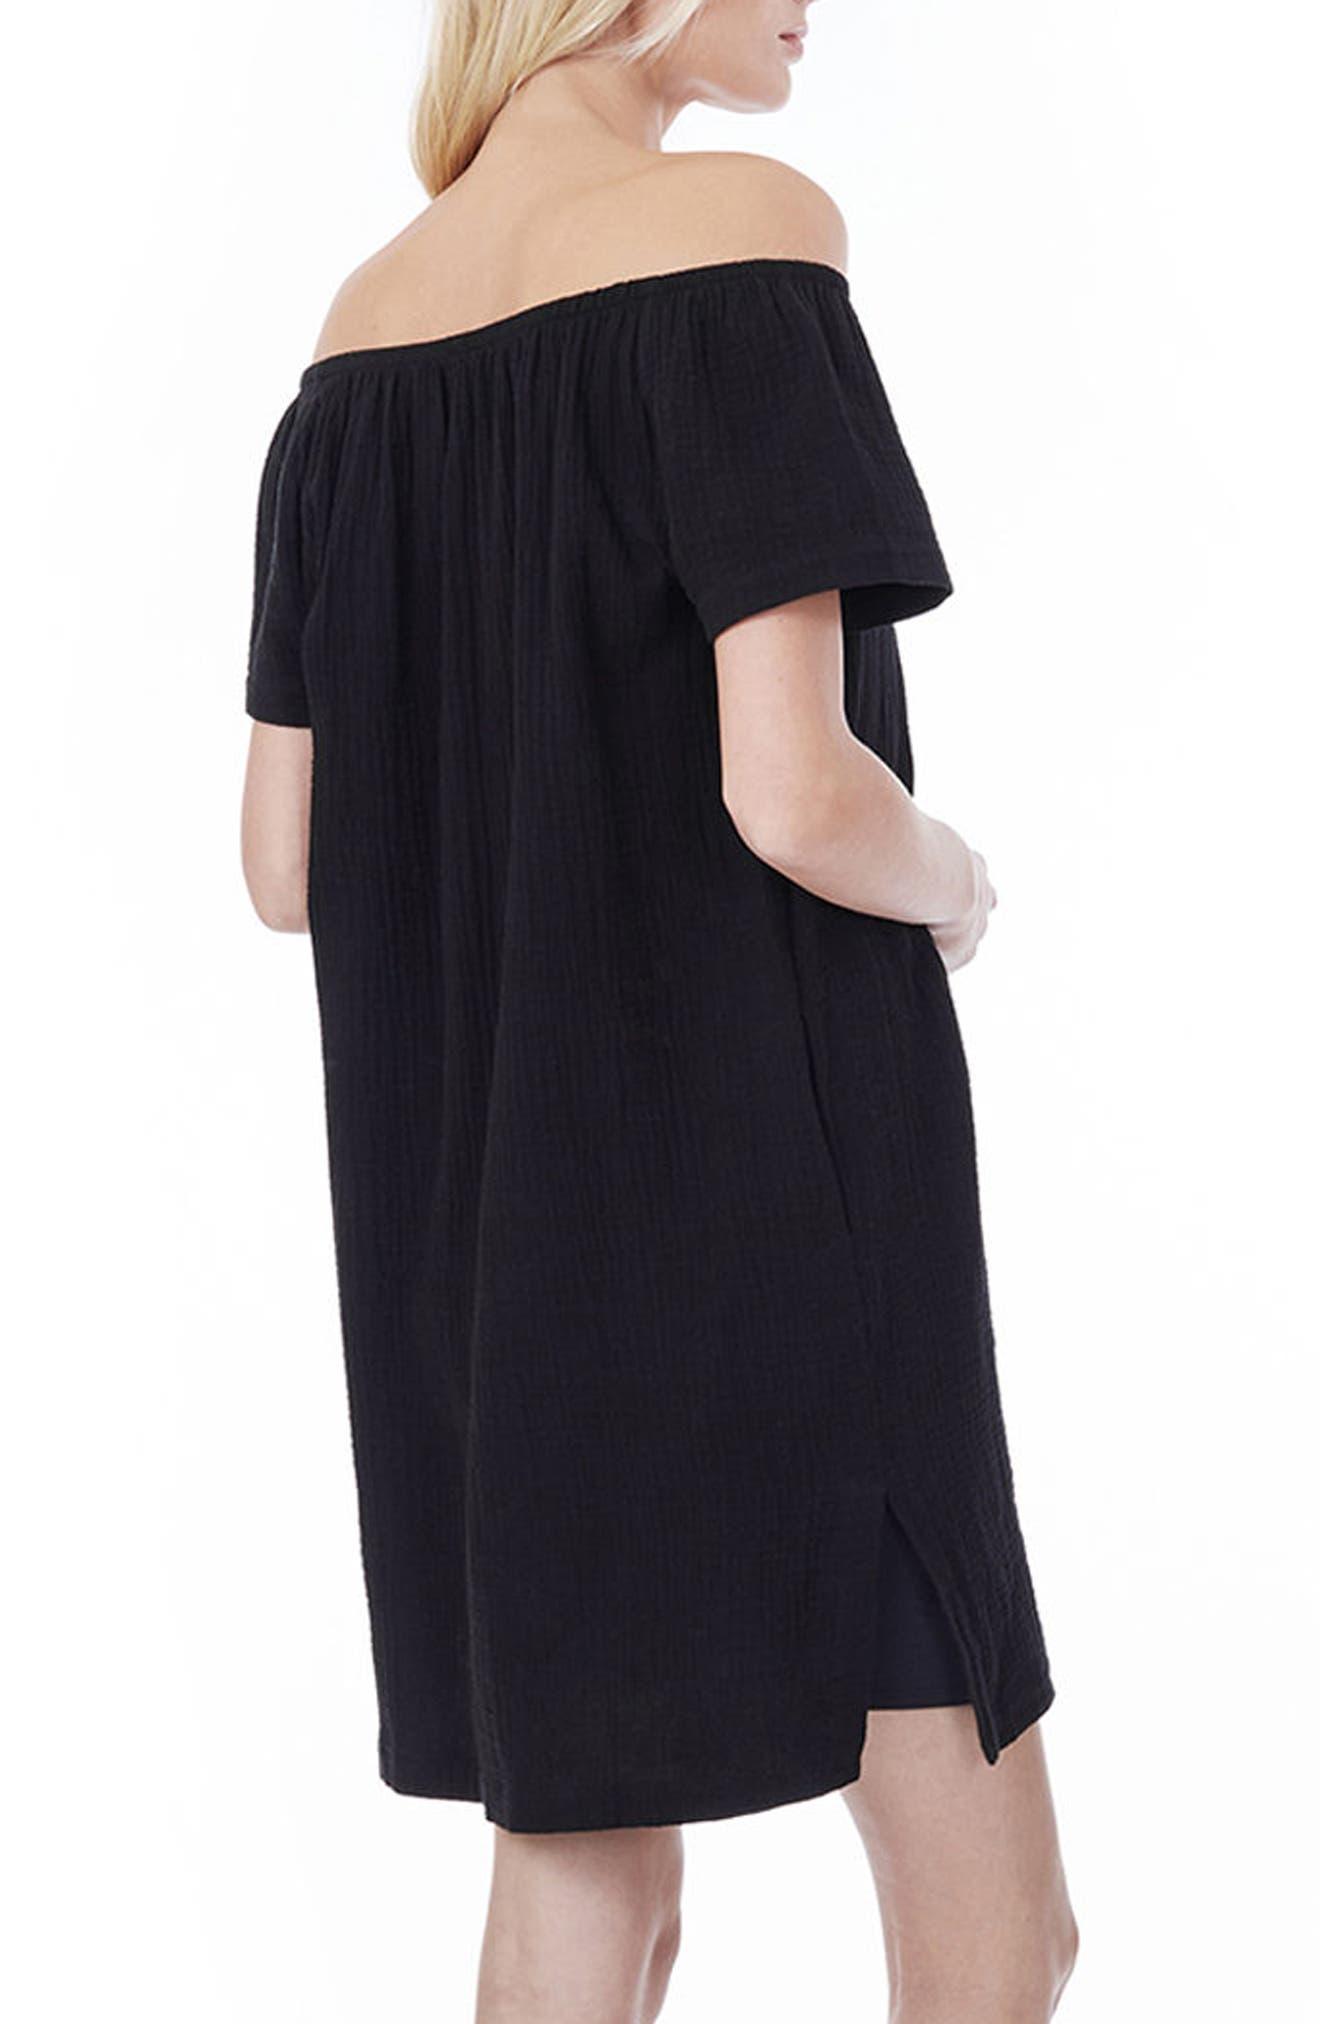 Alternate Image 2  - Loyal Hana Ariel Off The Shoulder Maternity/Nursing Dress